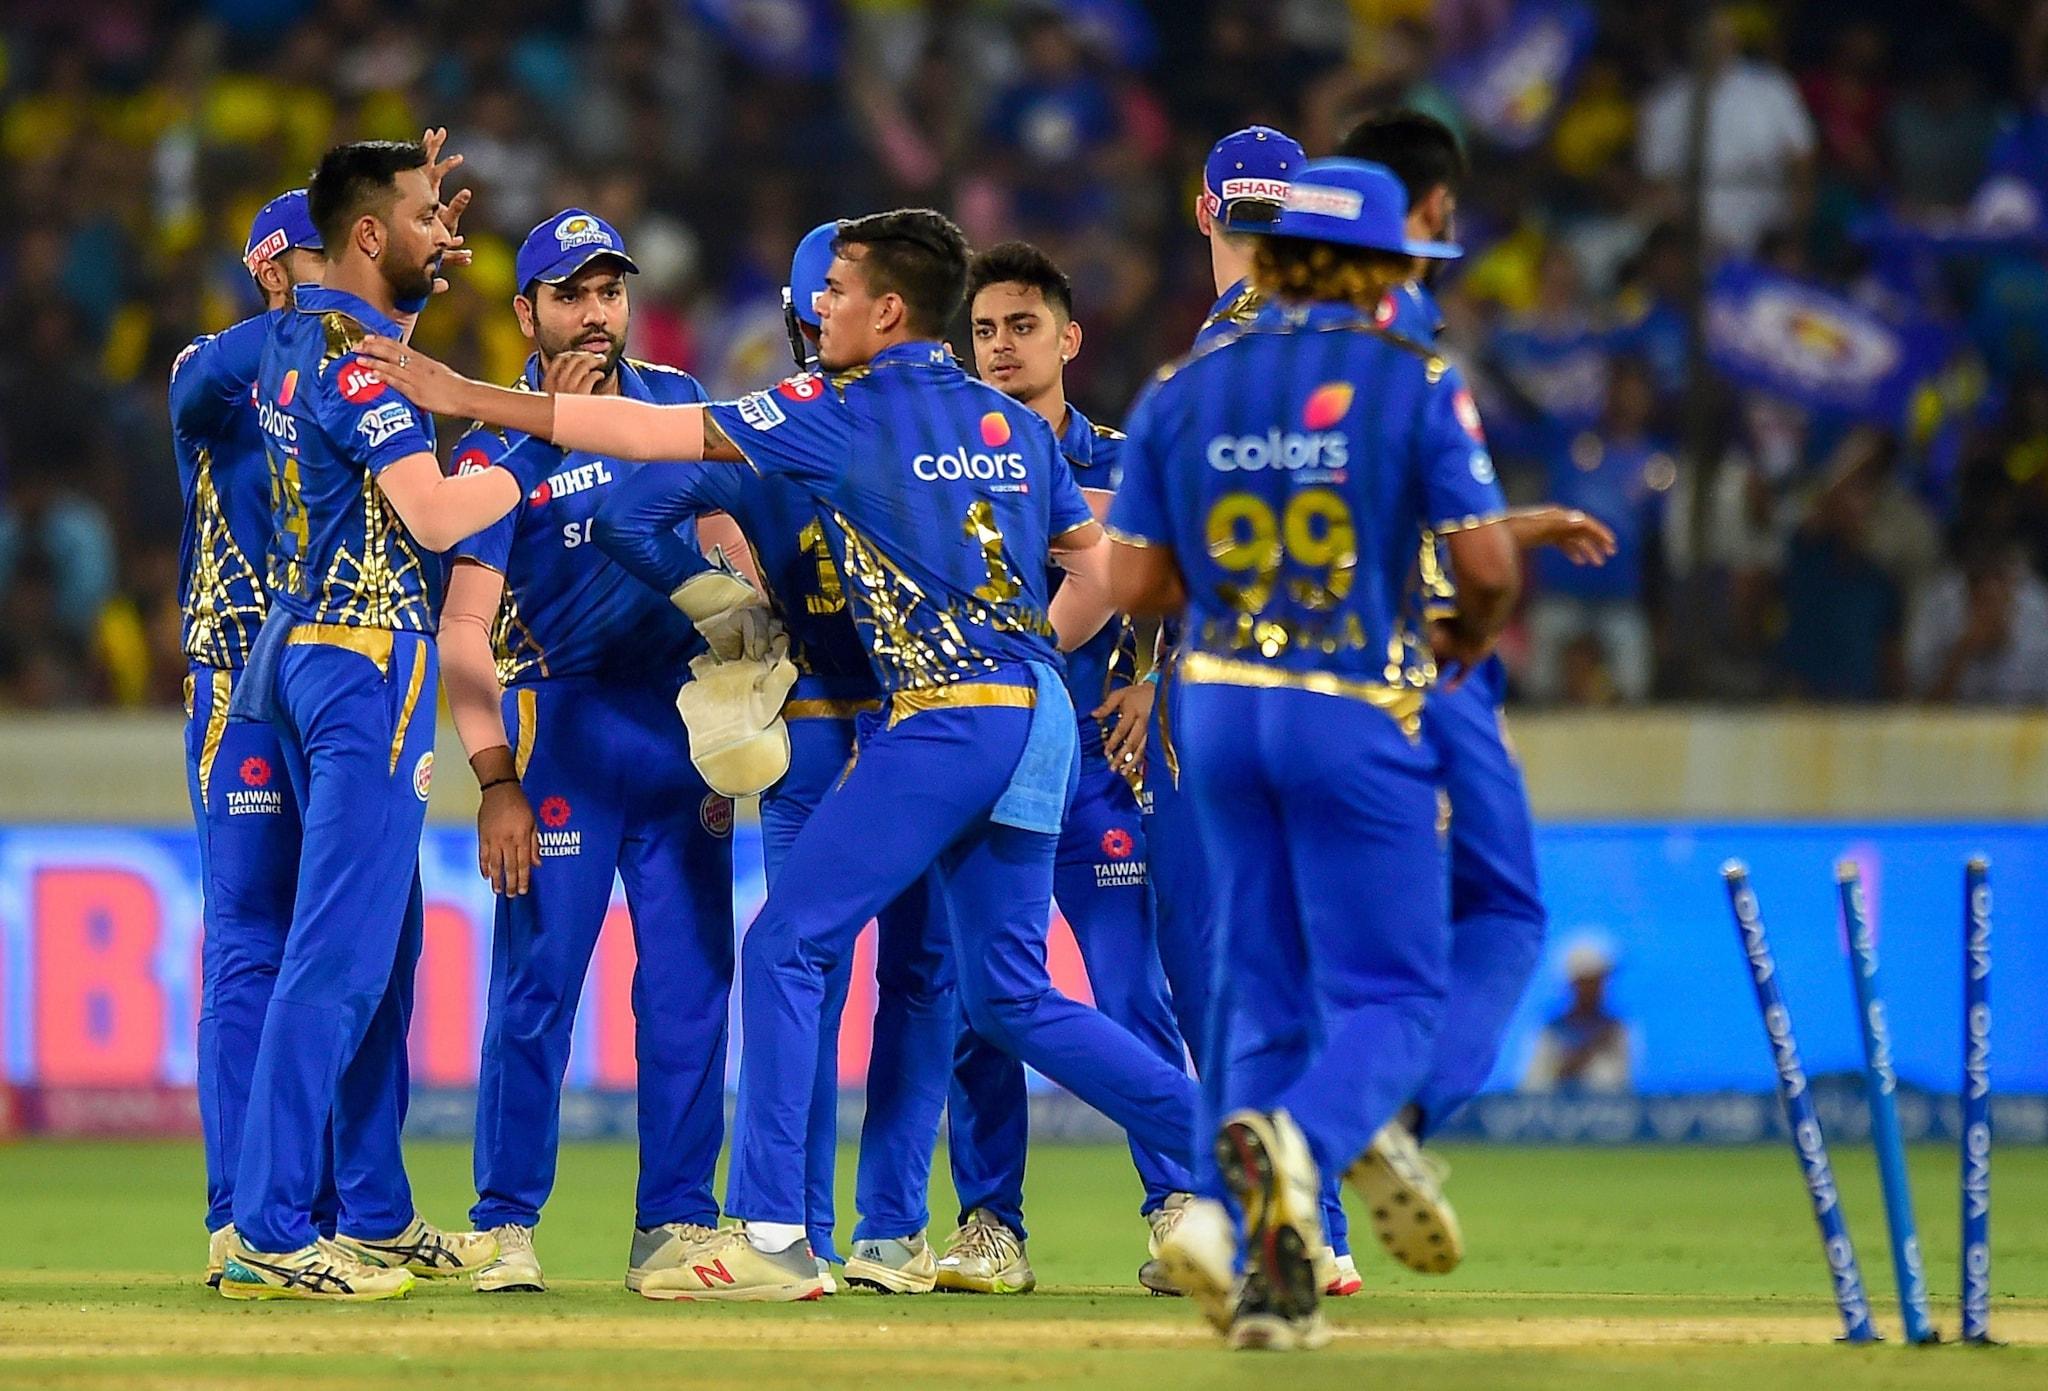 MI player Krunal Pandya celebrates with teammates after claiming the wicket of Chennai Super Kings (CSK) batsman Faf du Plessis | PTI